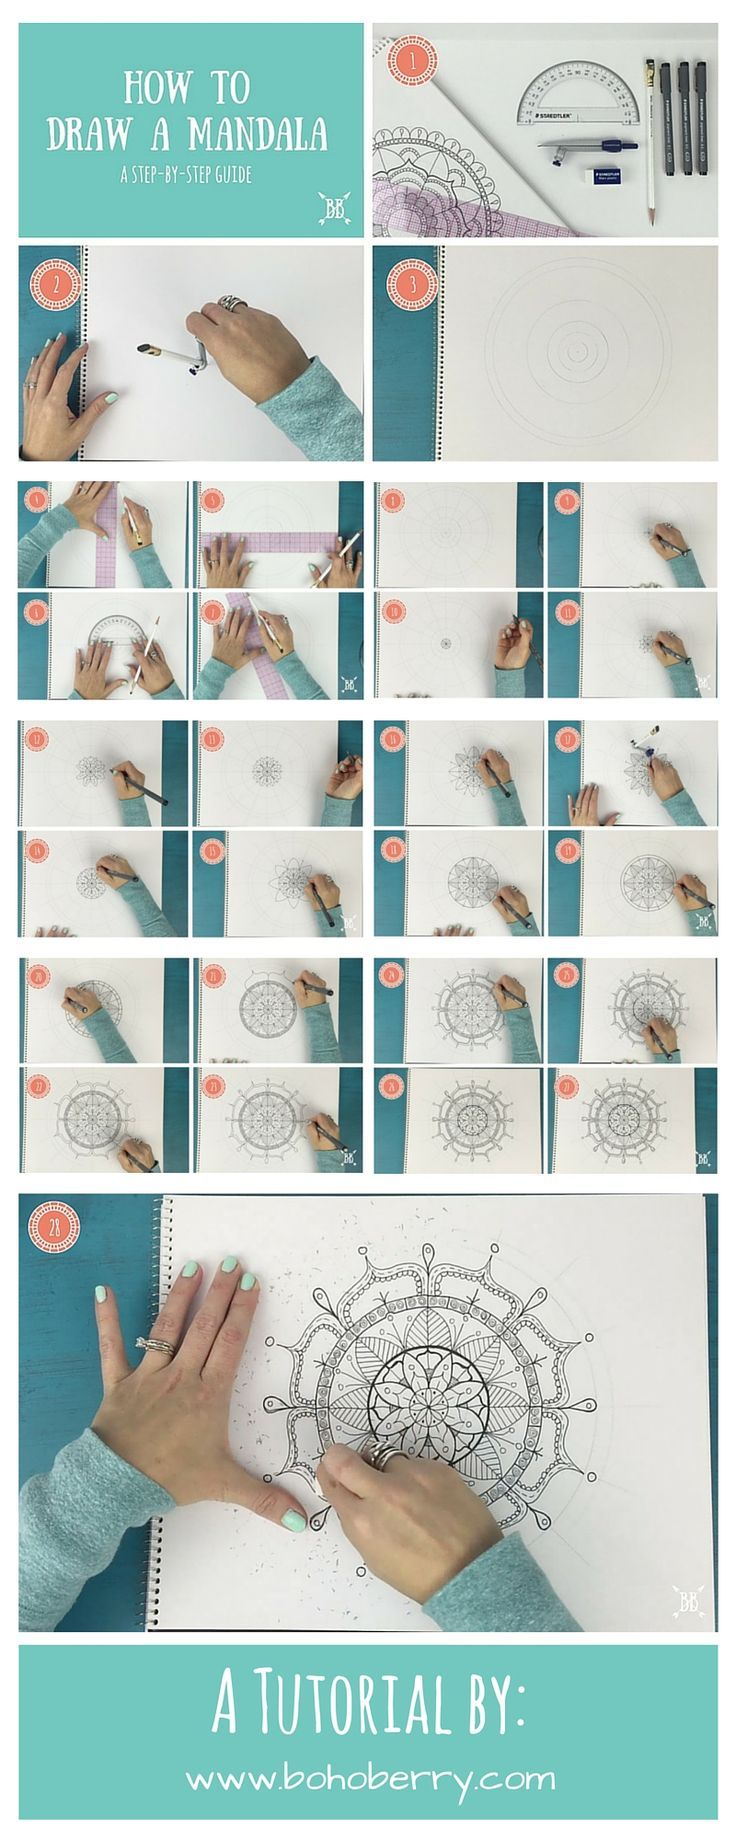 [PDF] Zentangle Basics : Learn To Draw Zentangle Patterns ...